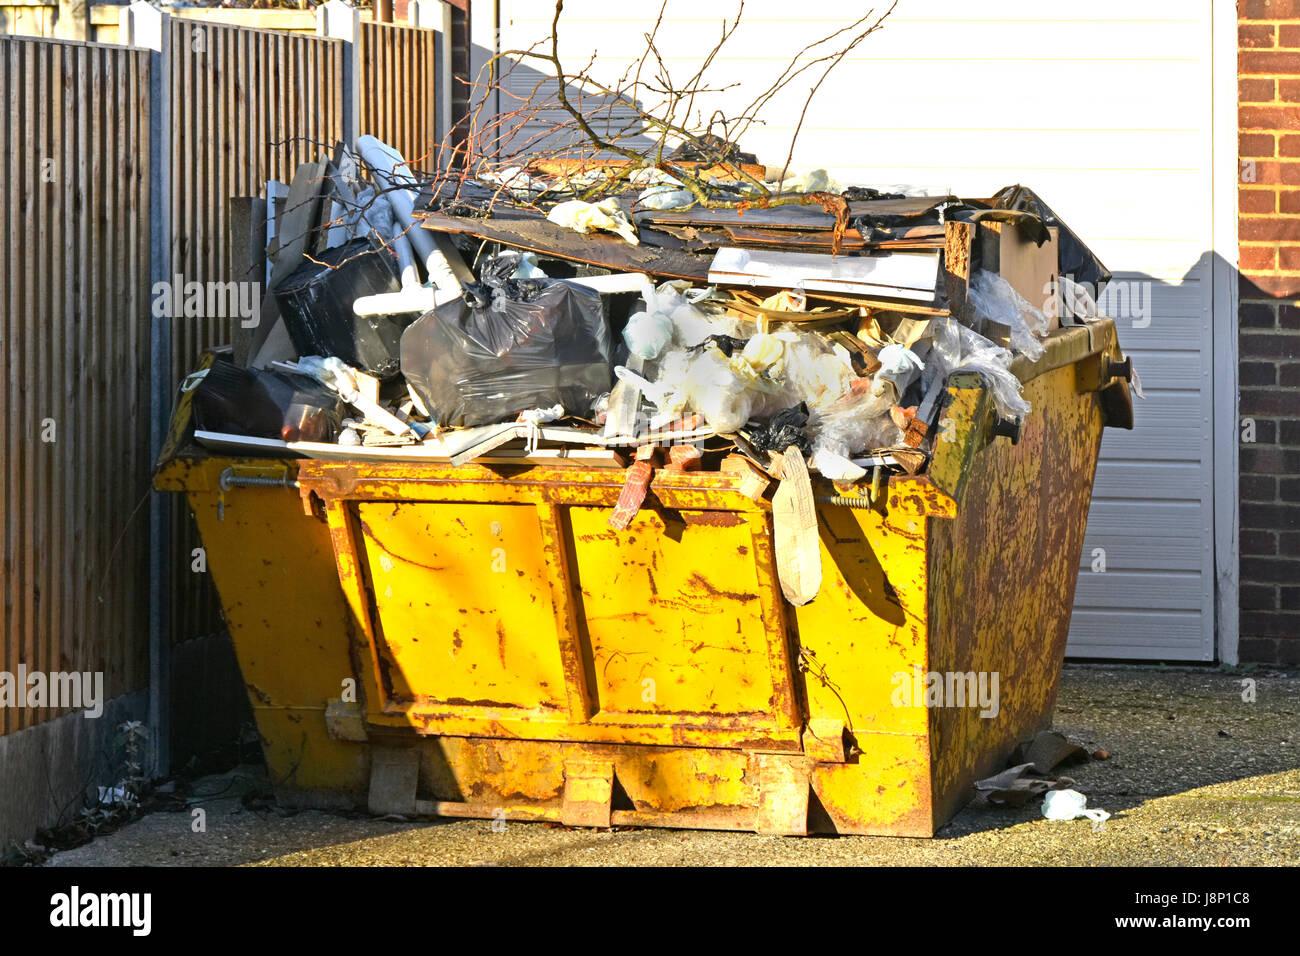 Full UK skip bin logística gestión de residuos del Reino Unido basura basura basura rebosante esperando Imagen De Stock